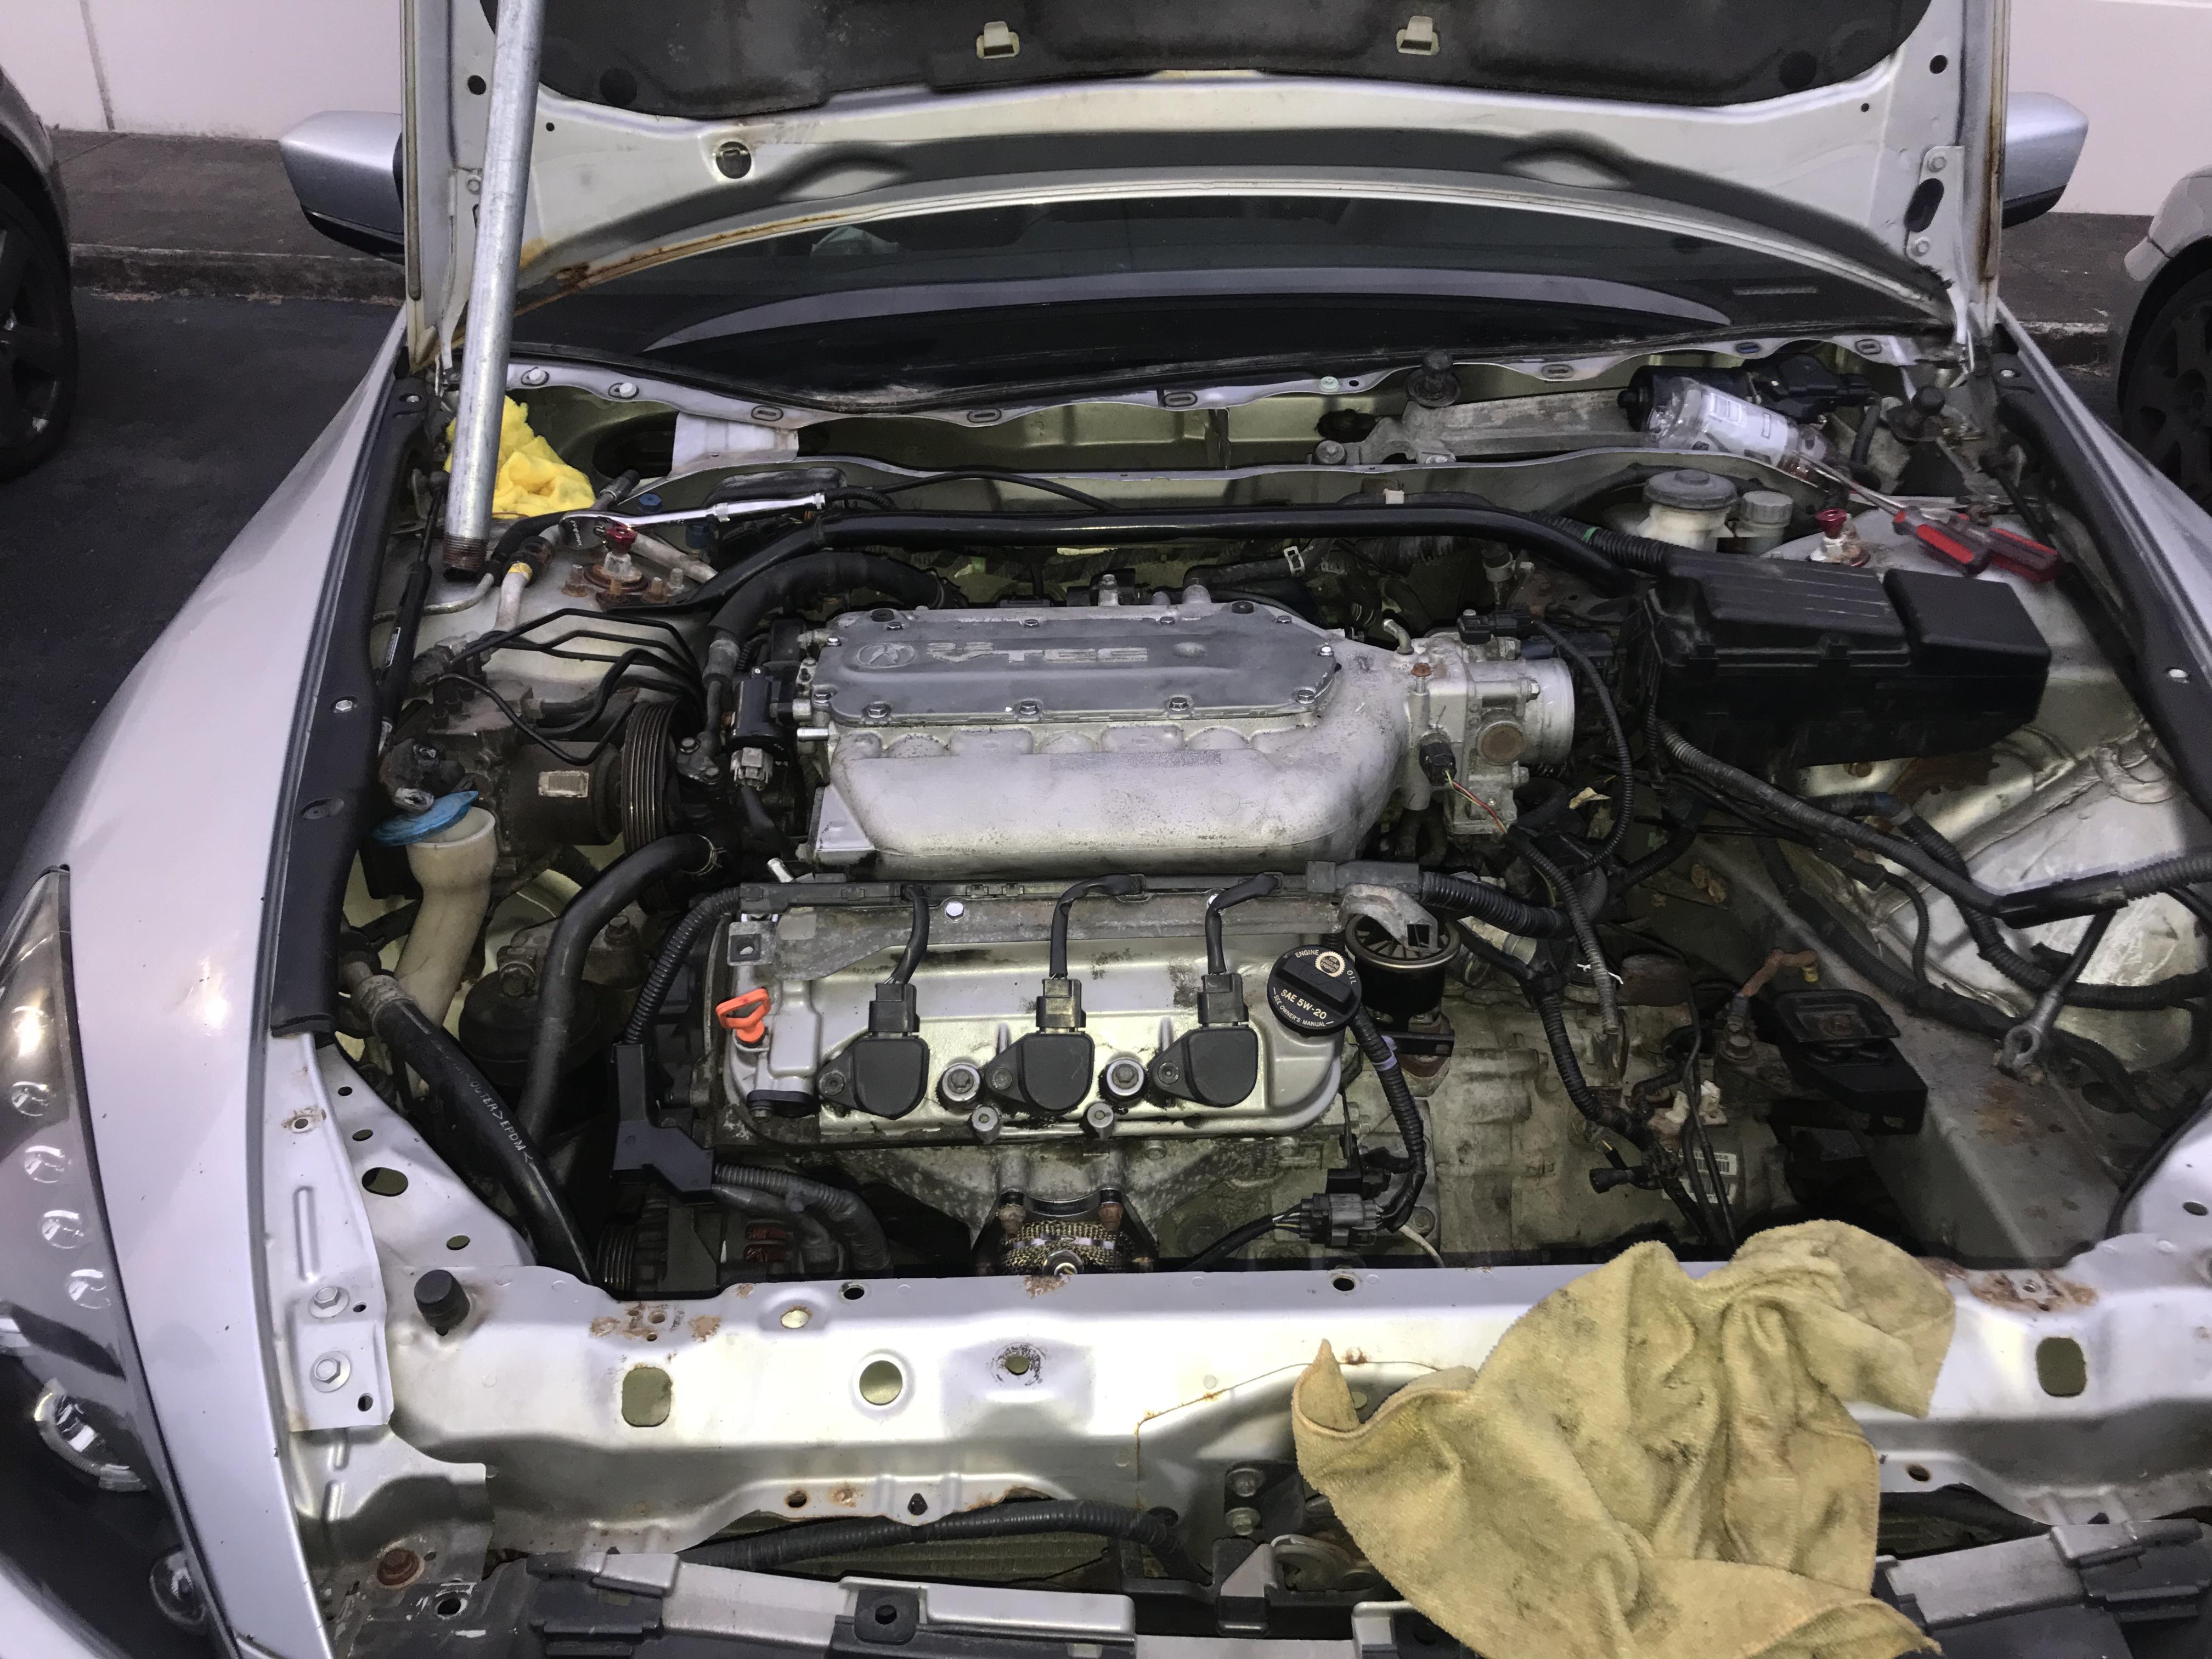 3.2 TL motor swapped success-a87429c5-c9d6-45c1-a629-1f6f806d7daf_1529000344564.jpeg